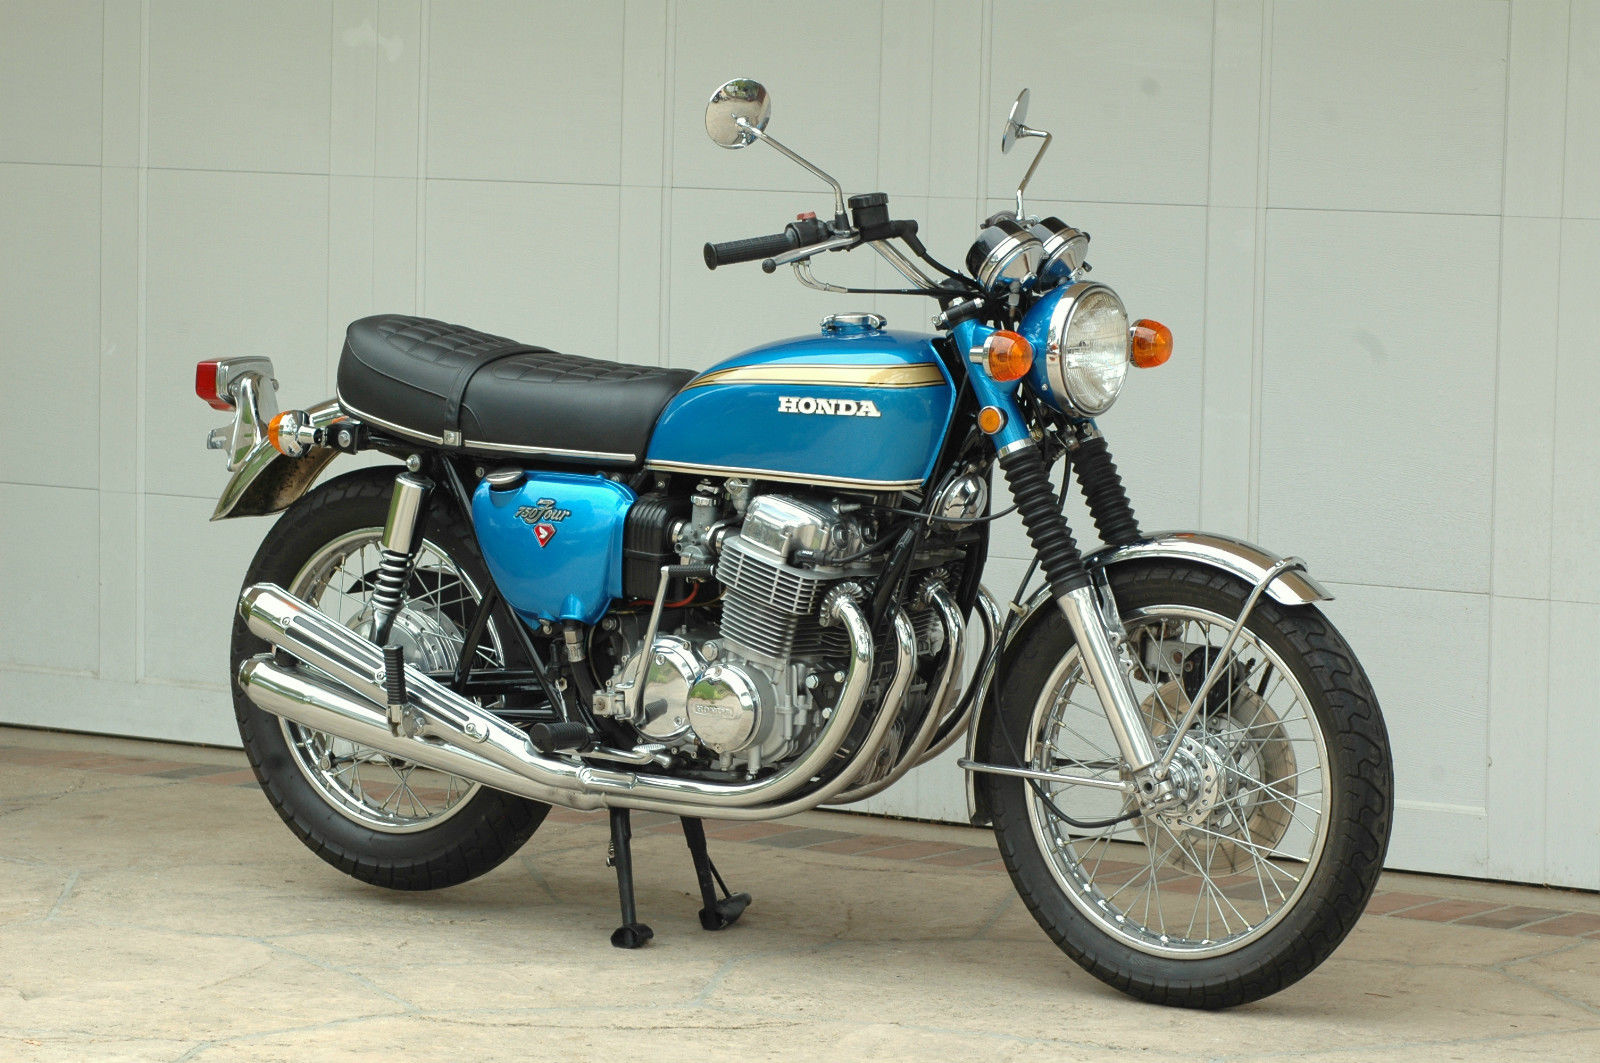 Motocicleta vintage Honda 1970